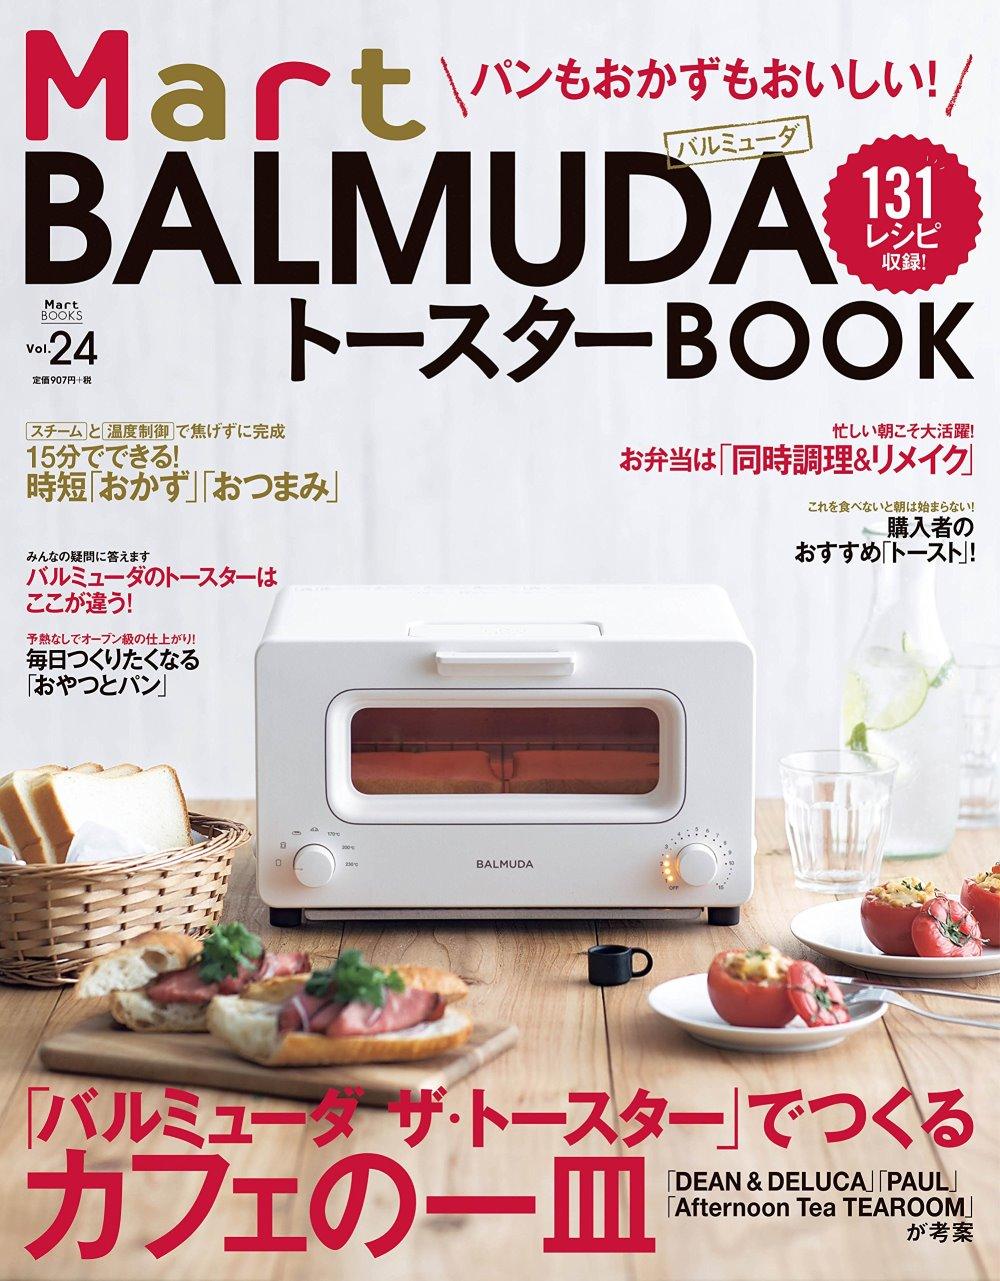 BALMUDA The Toaster蒸氣烤麵包機製作美味料理食譜集